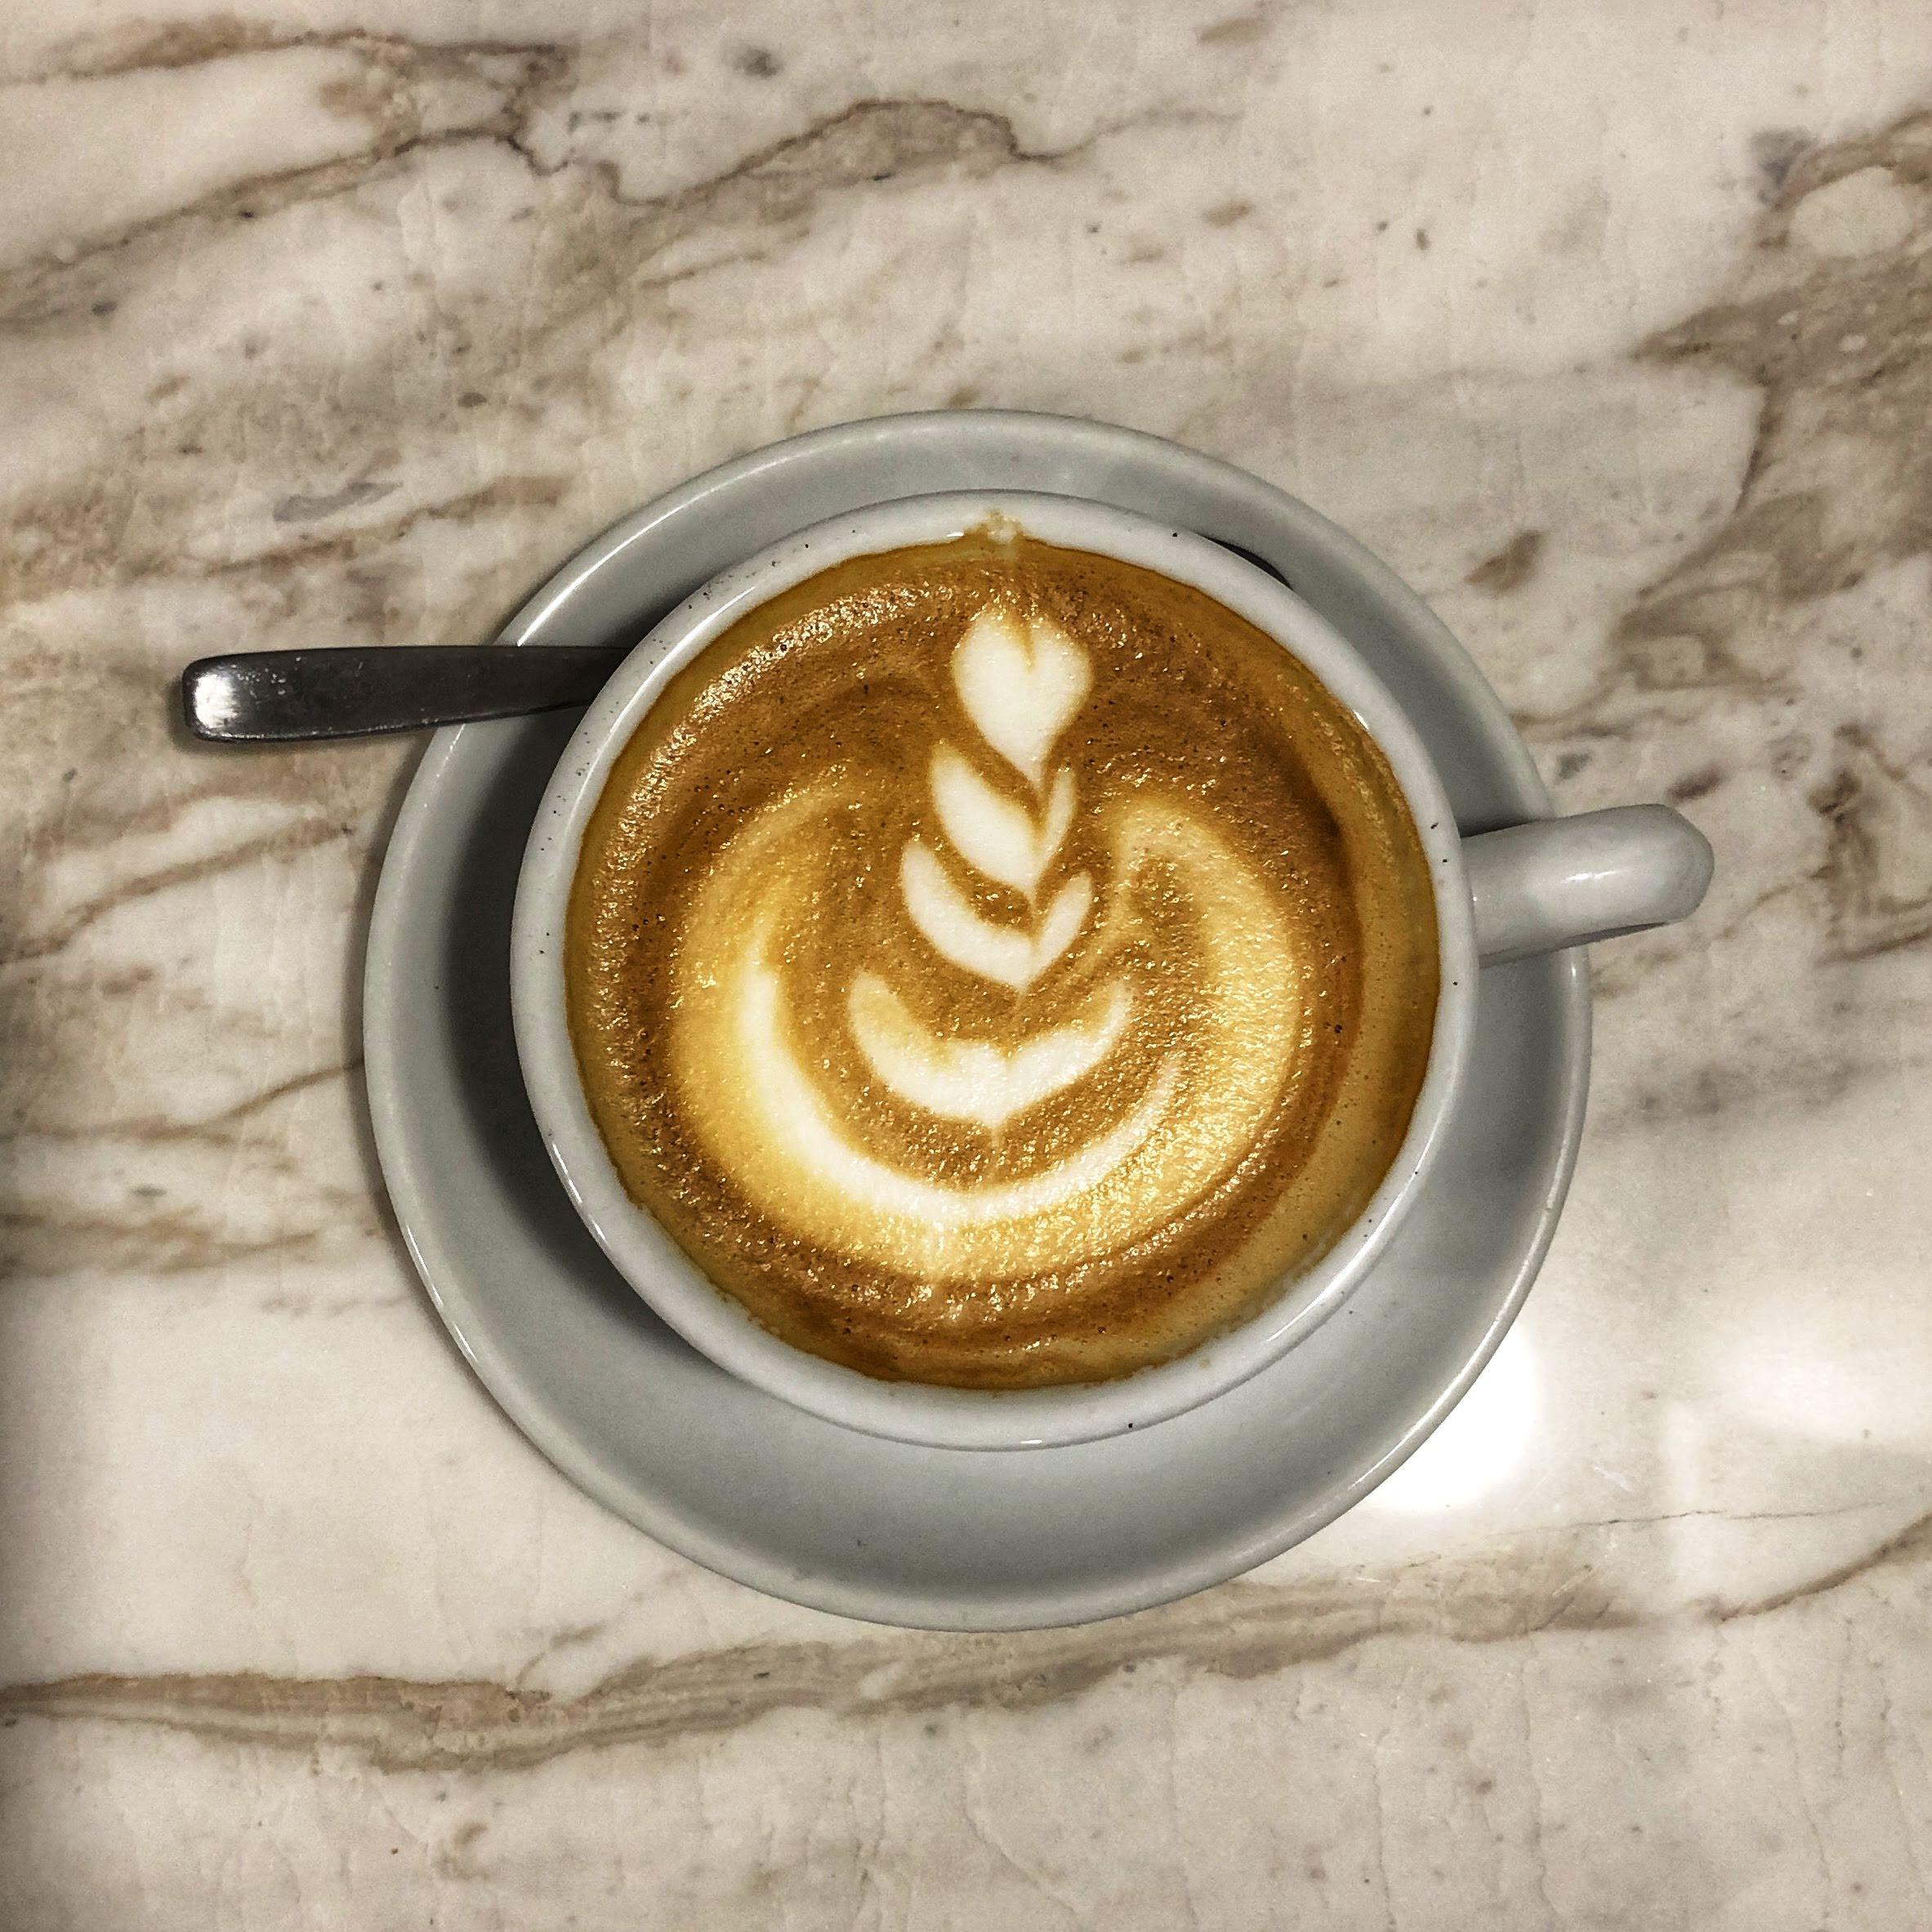 The Lab Coffee Roasters latte